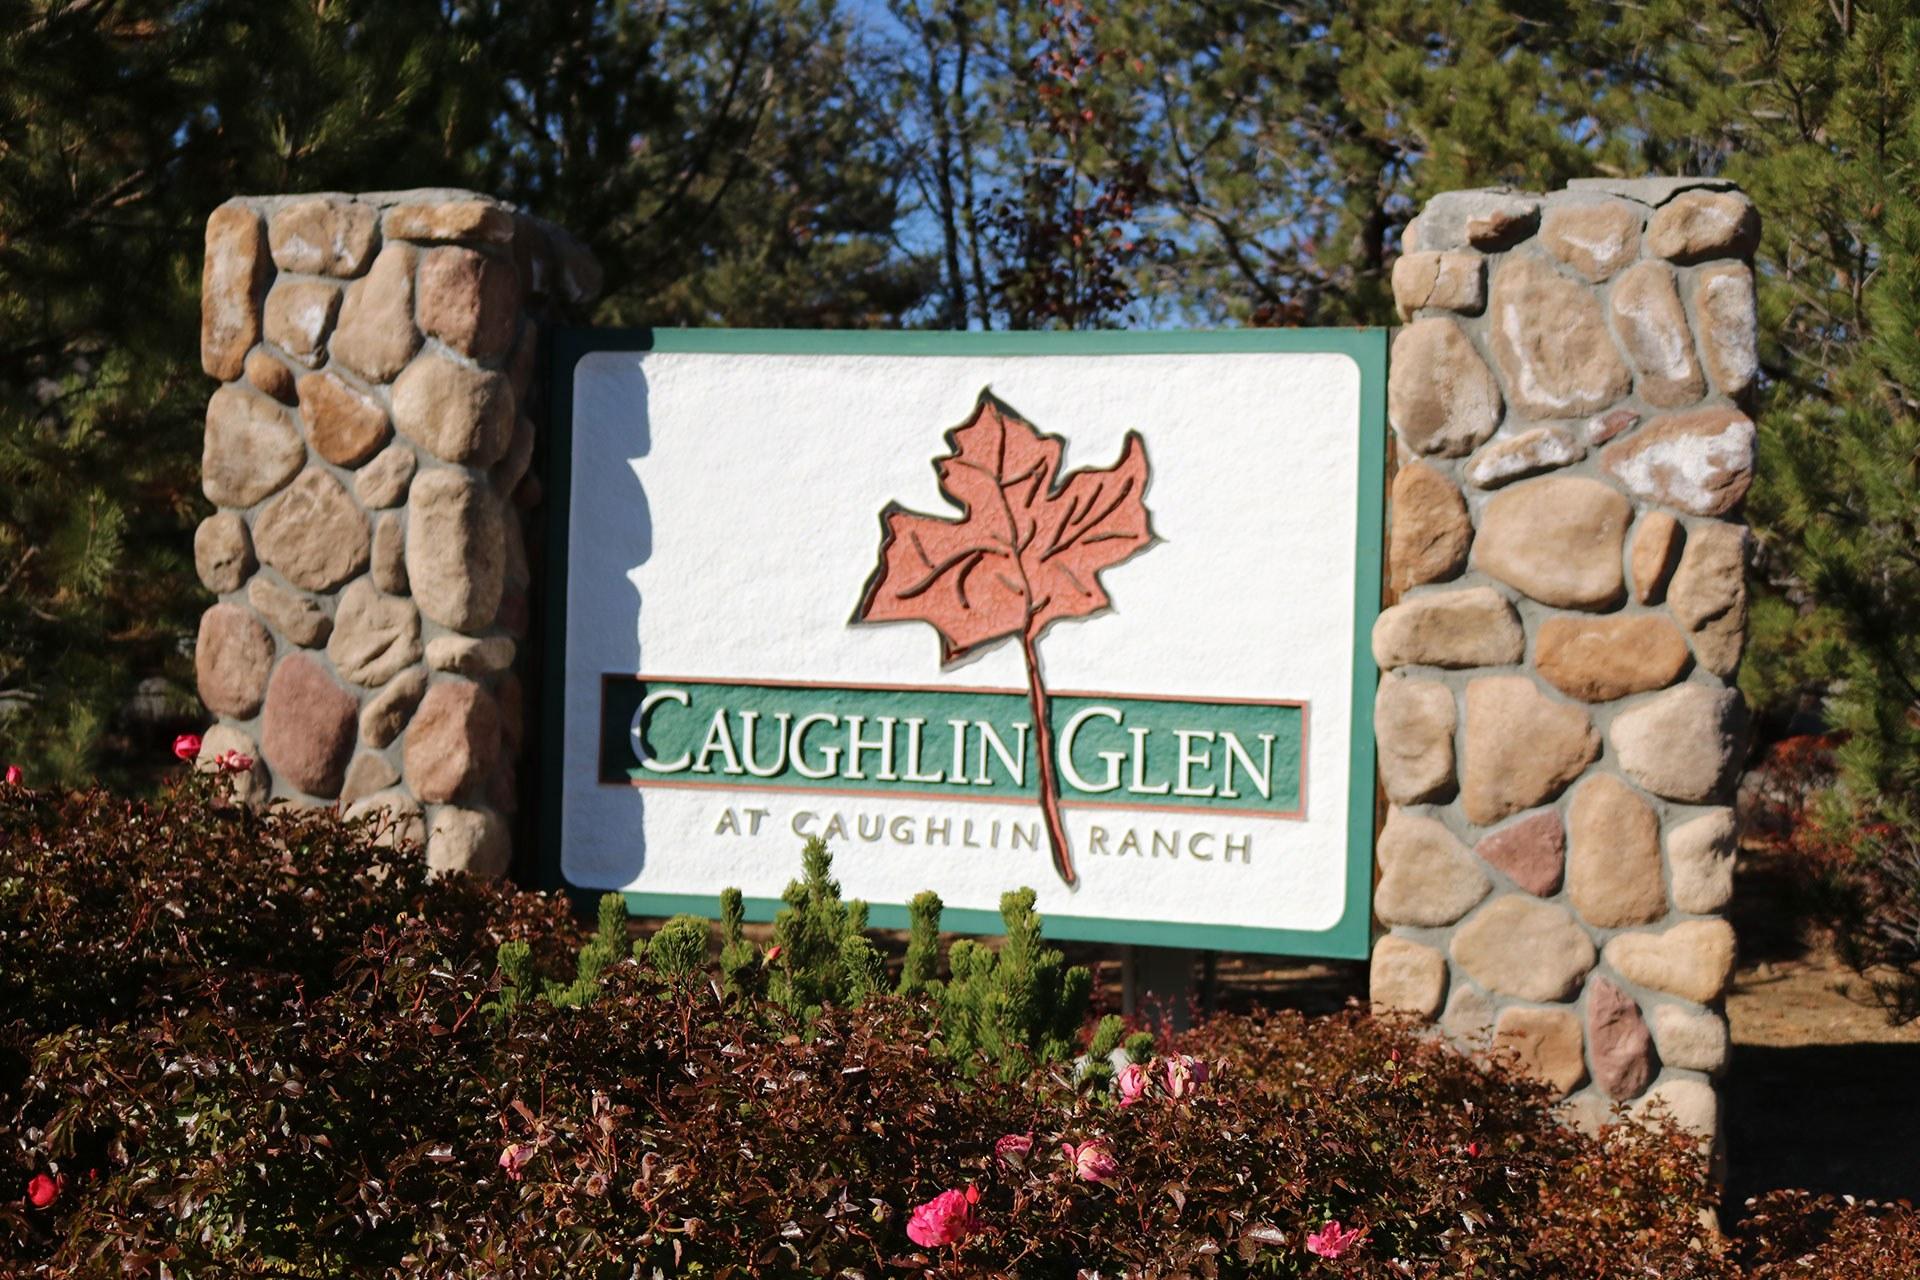 caughlin glen homes for sale reno nv